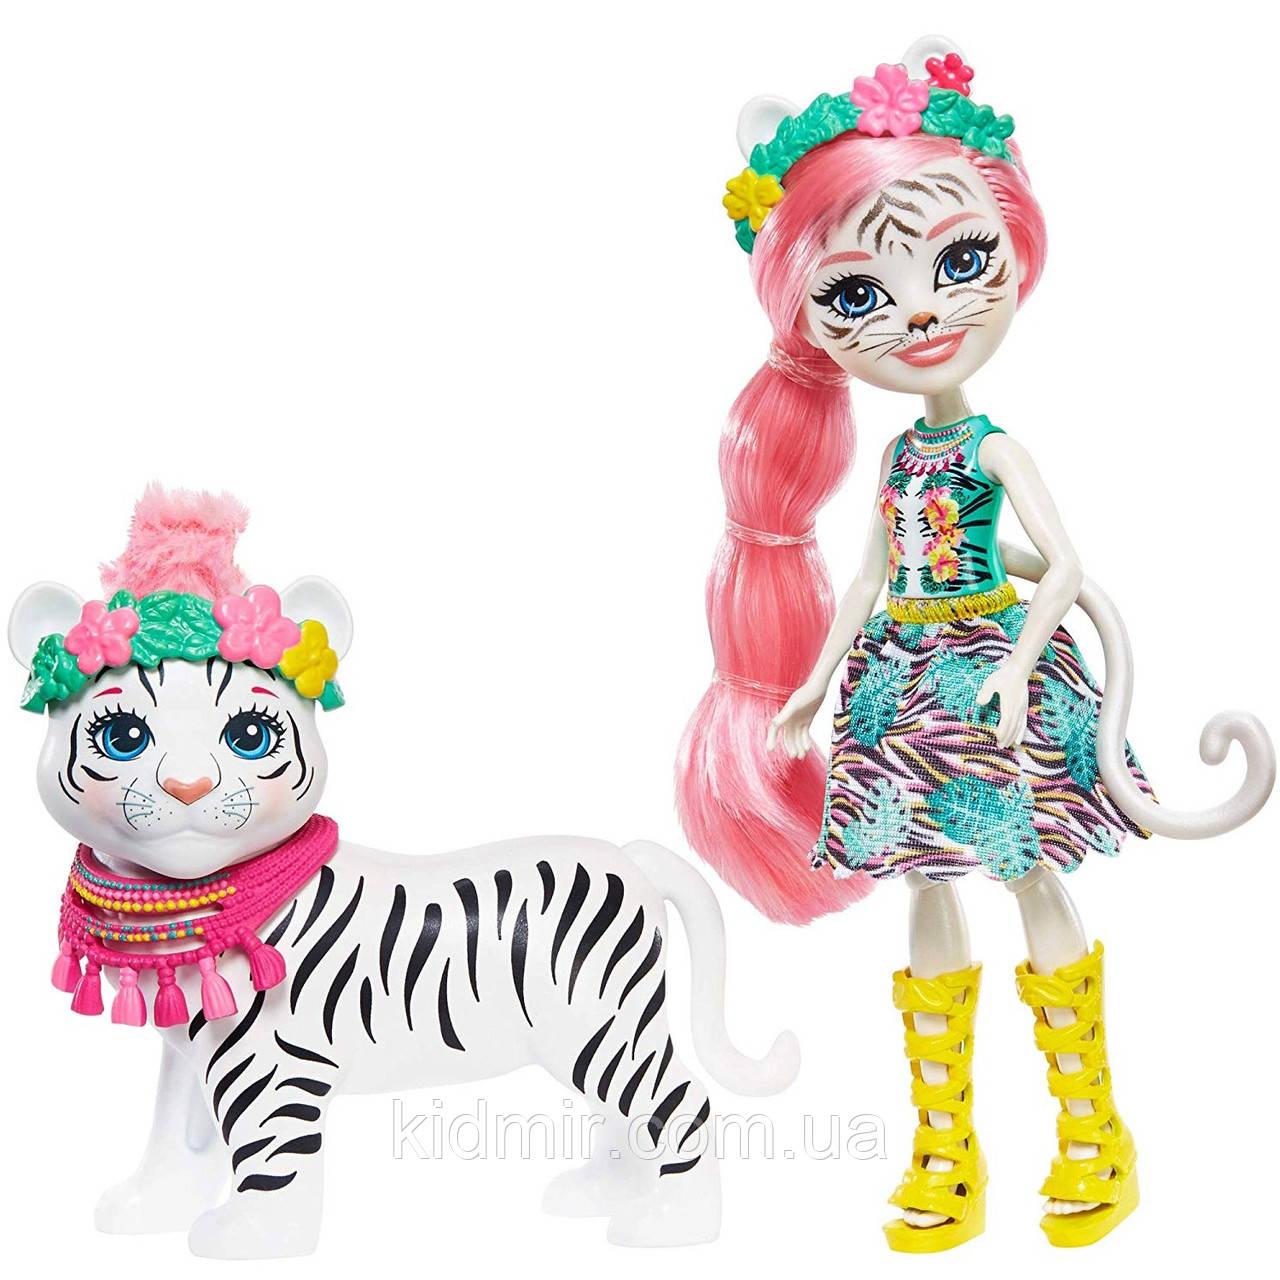 Кукла Enchantimals Белый тигр Тэдли Тайгер с большой зверюшкой GFN57